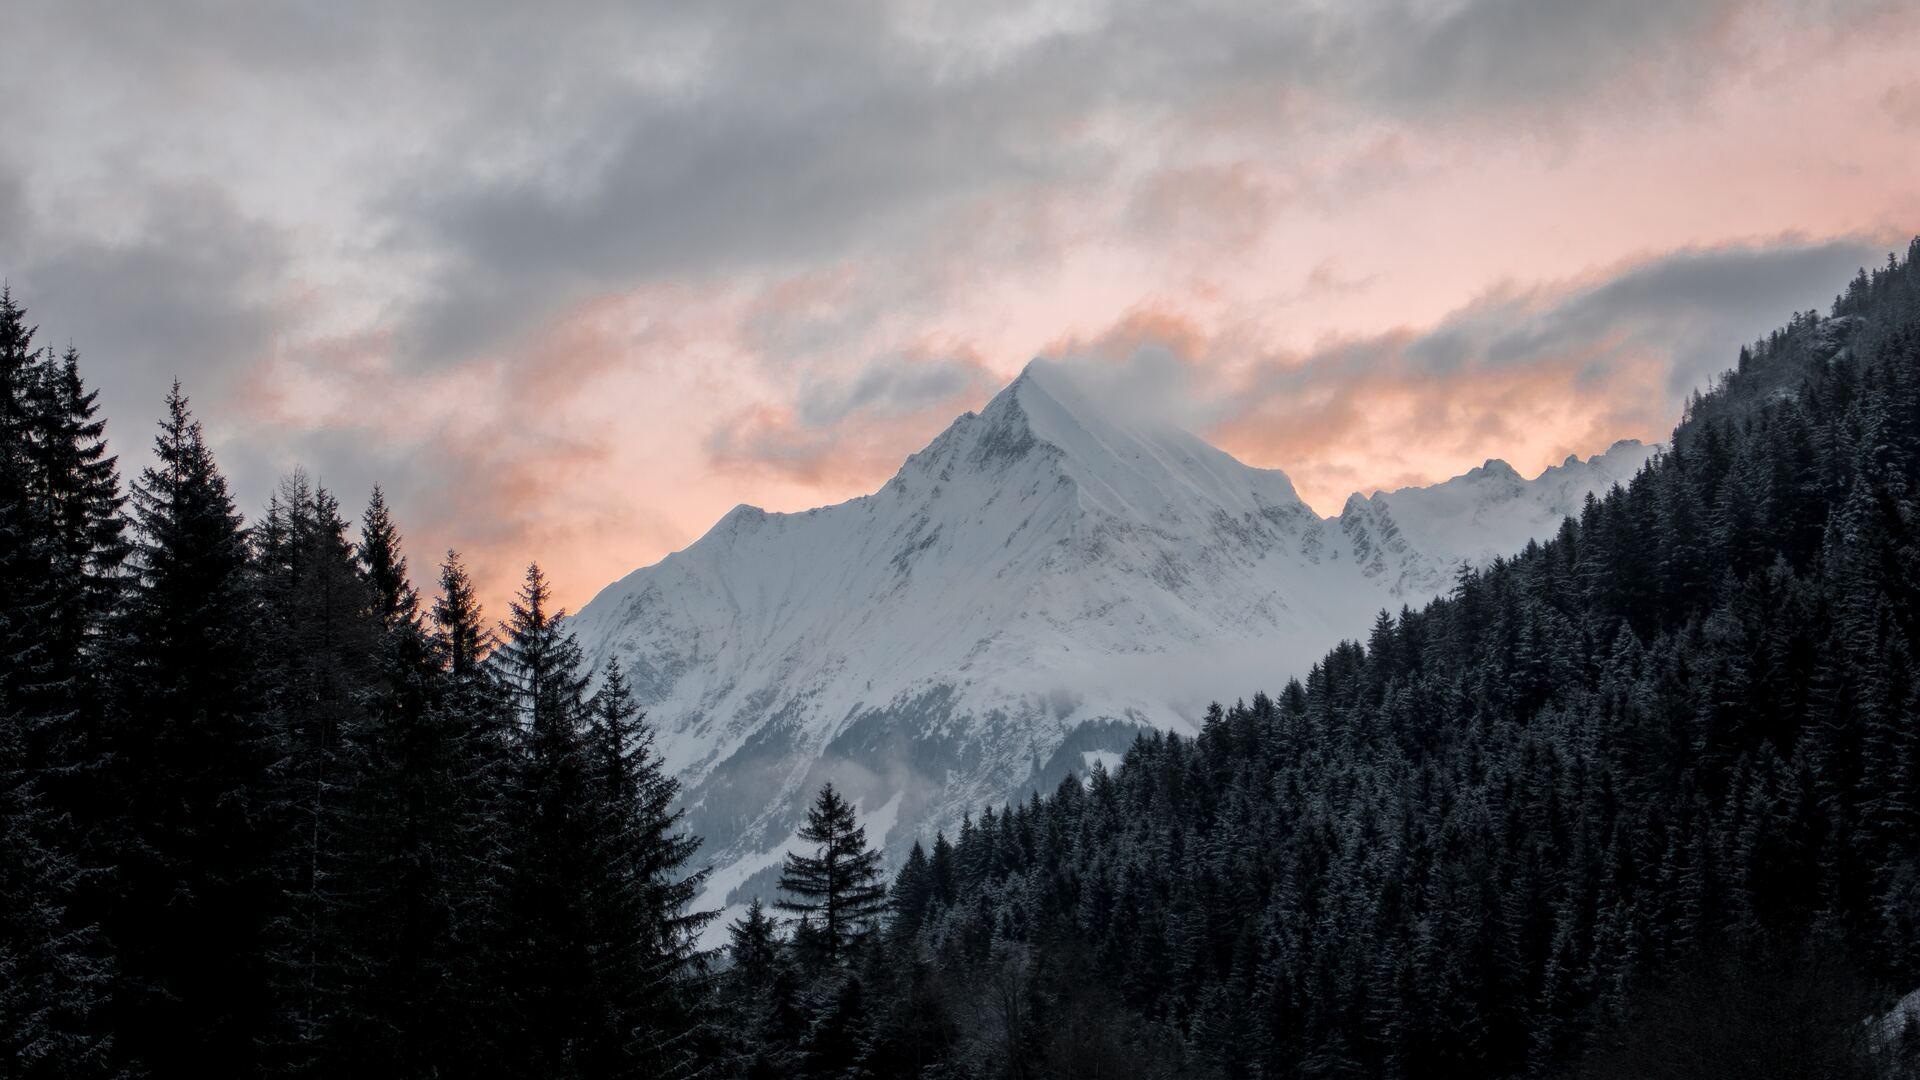 white-snow-capped-mountain-5k-cp.jpg